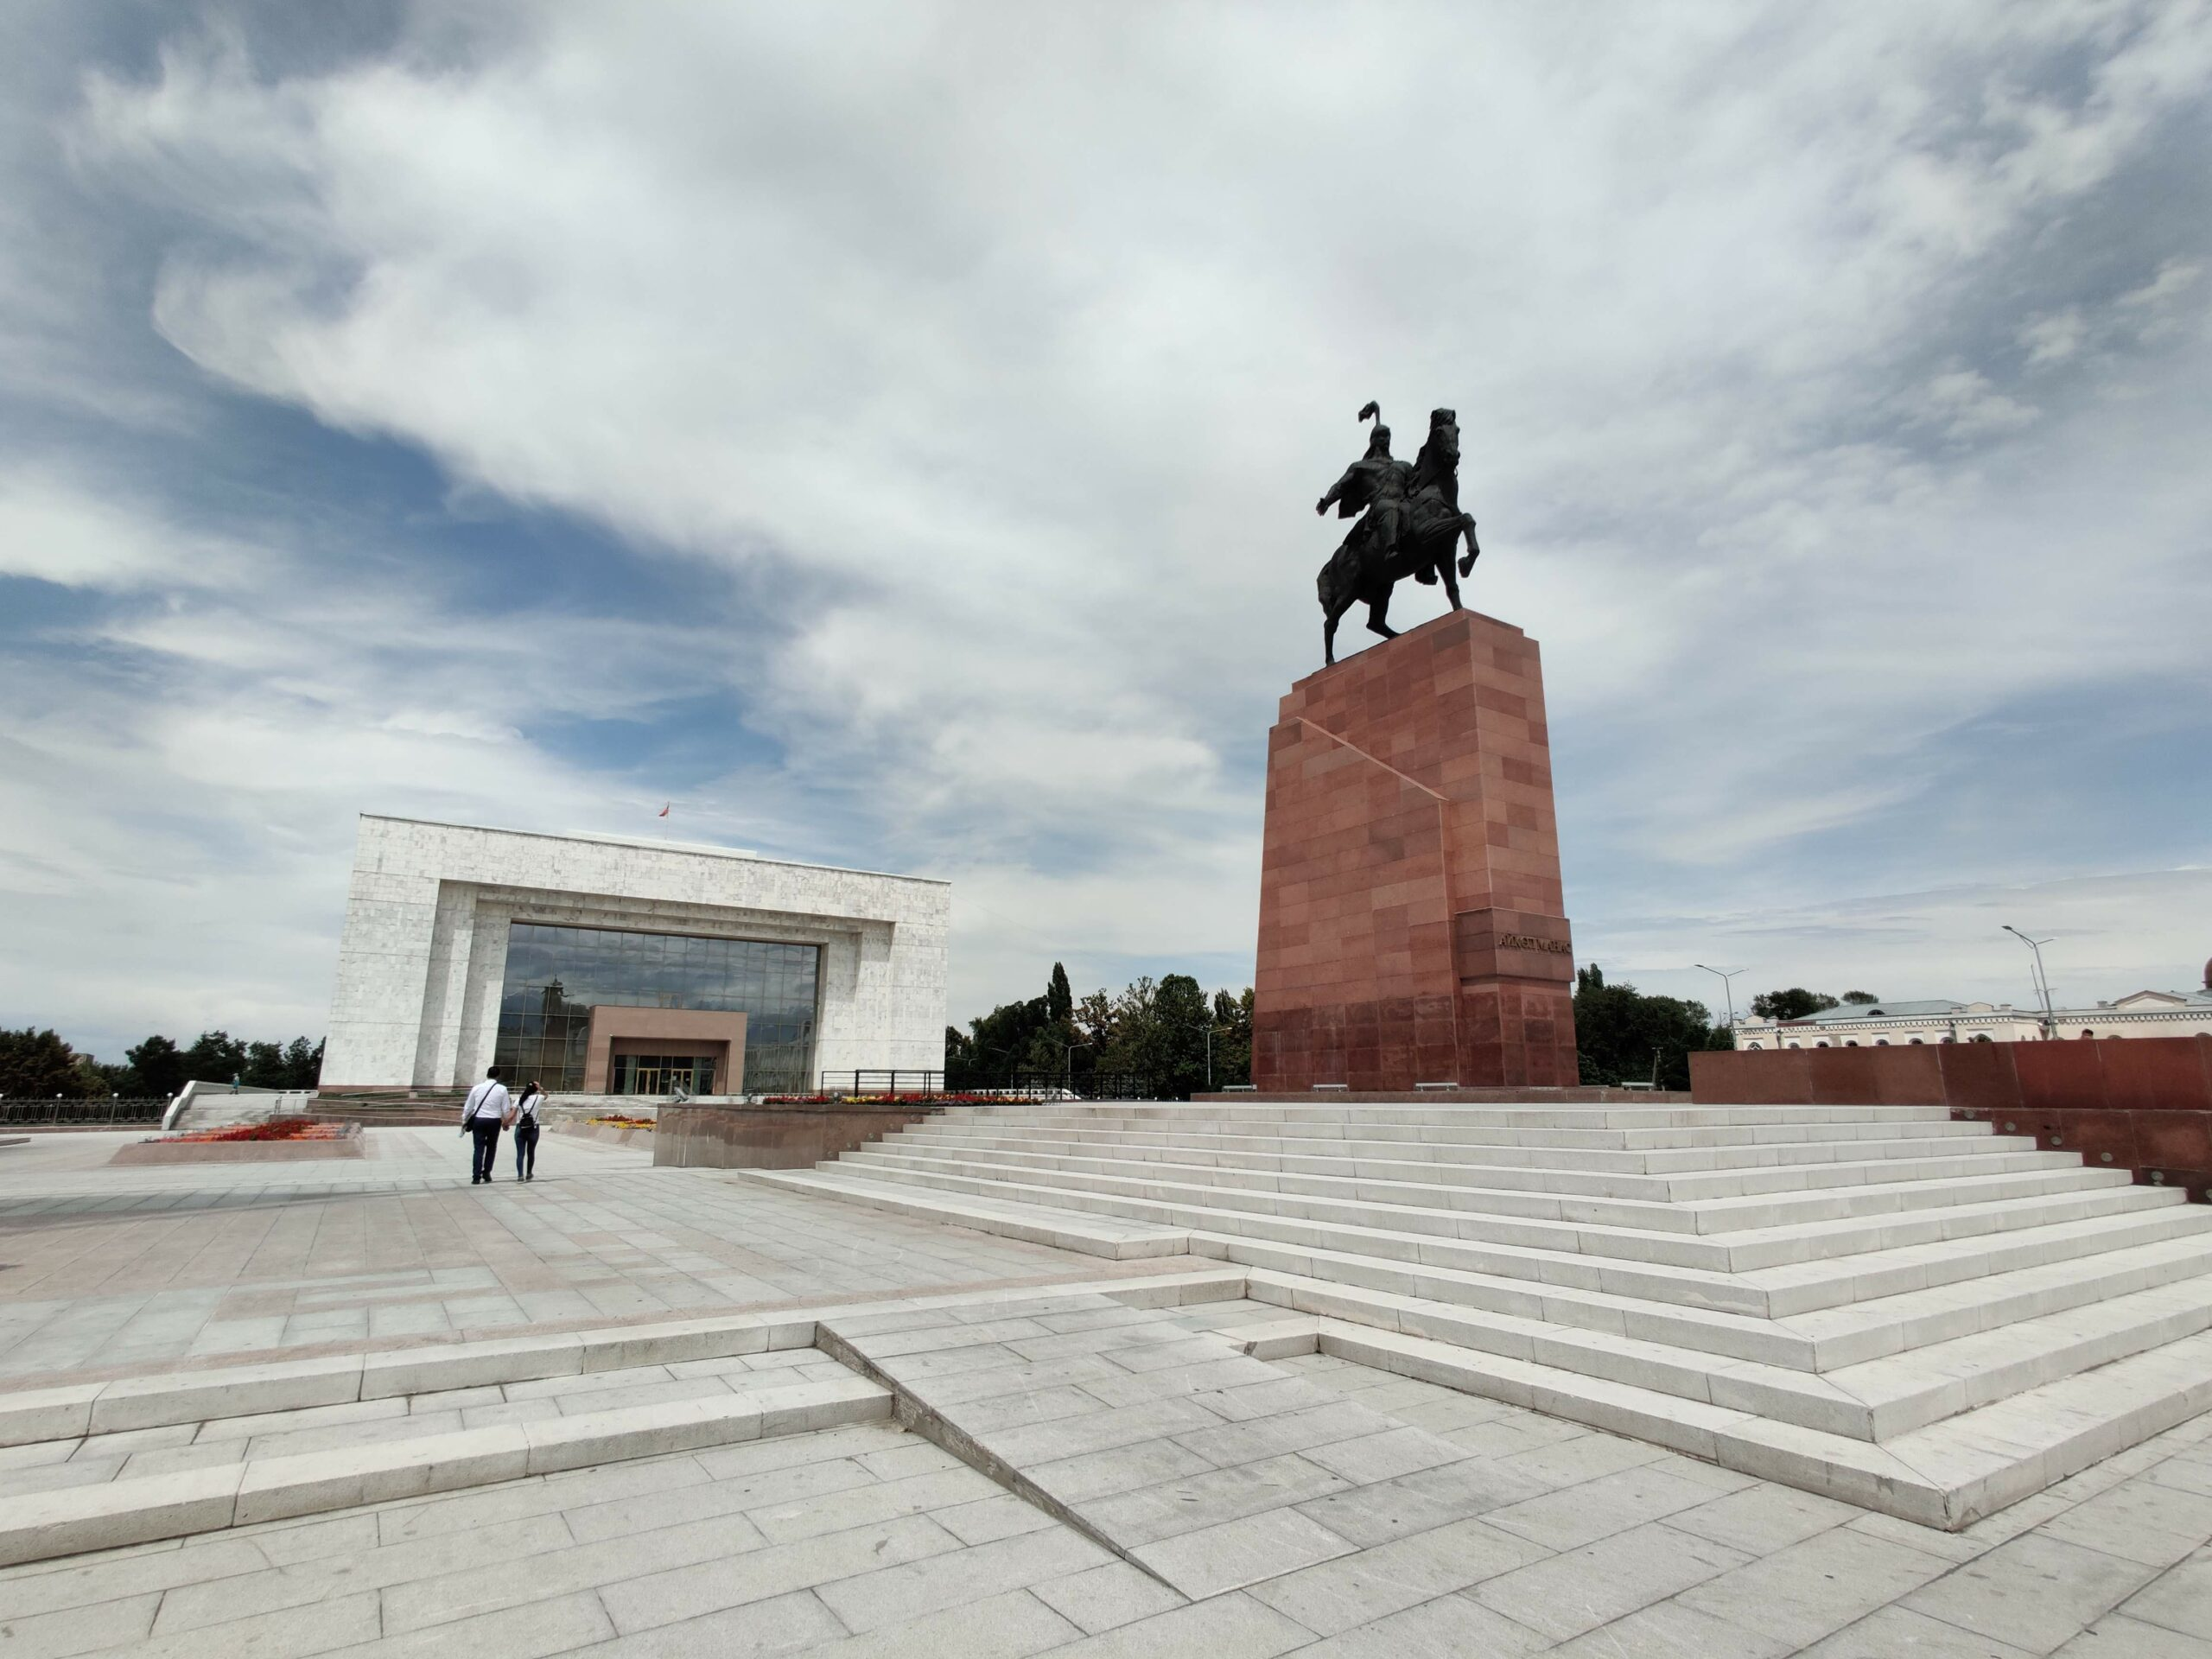 Rondreis Kirgizië 18 dagen - Ala Too Square – Bishkek (hoofdstad)